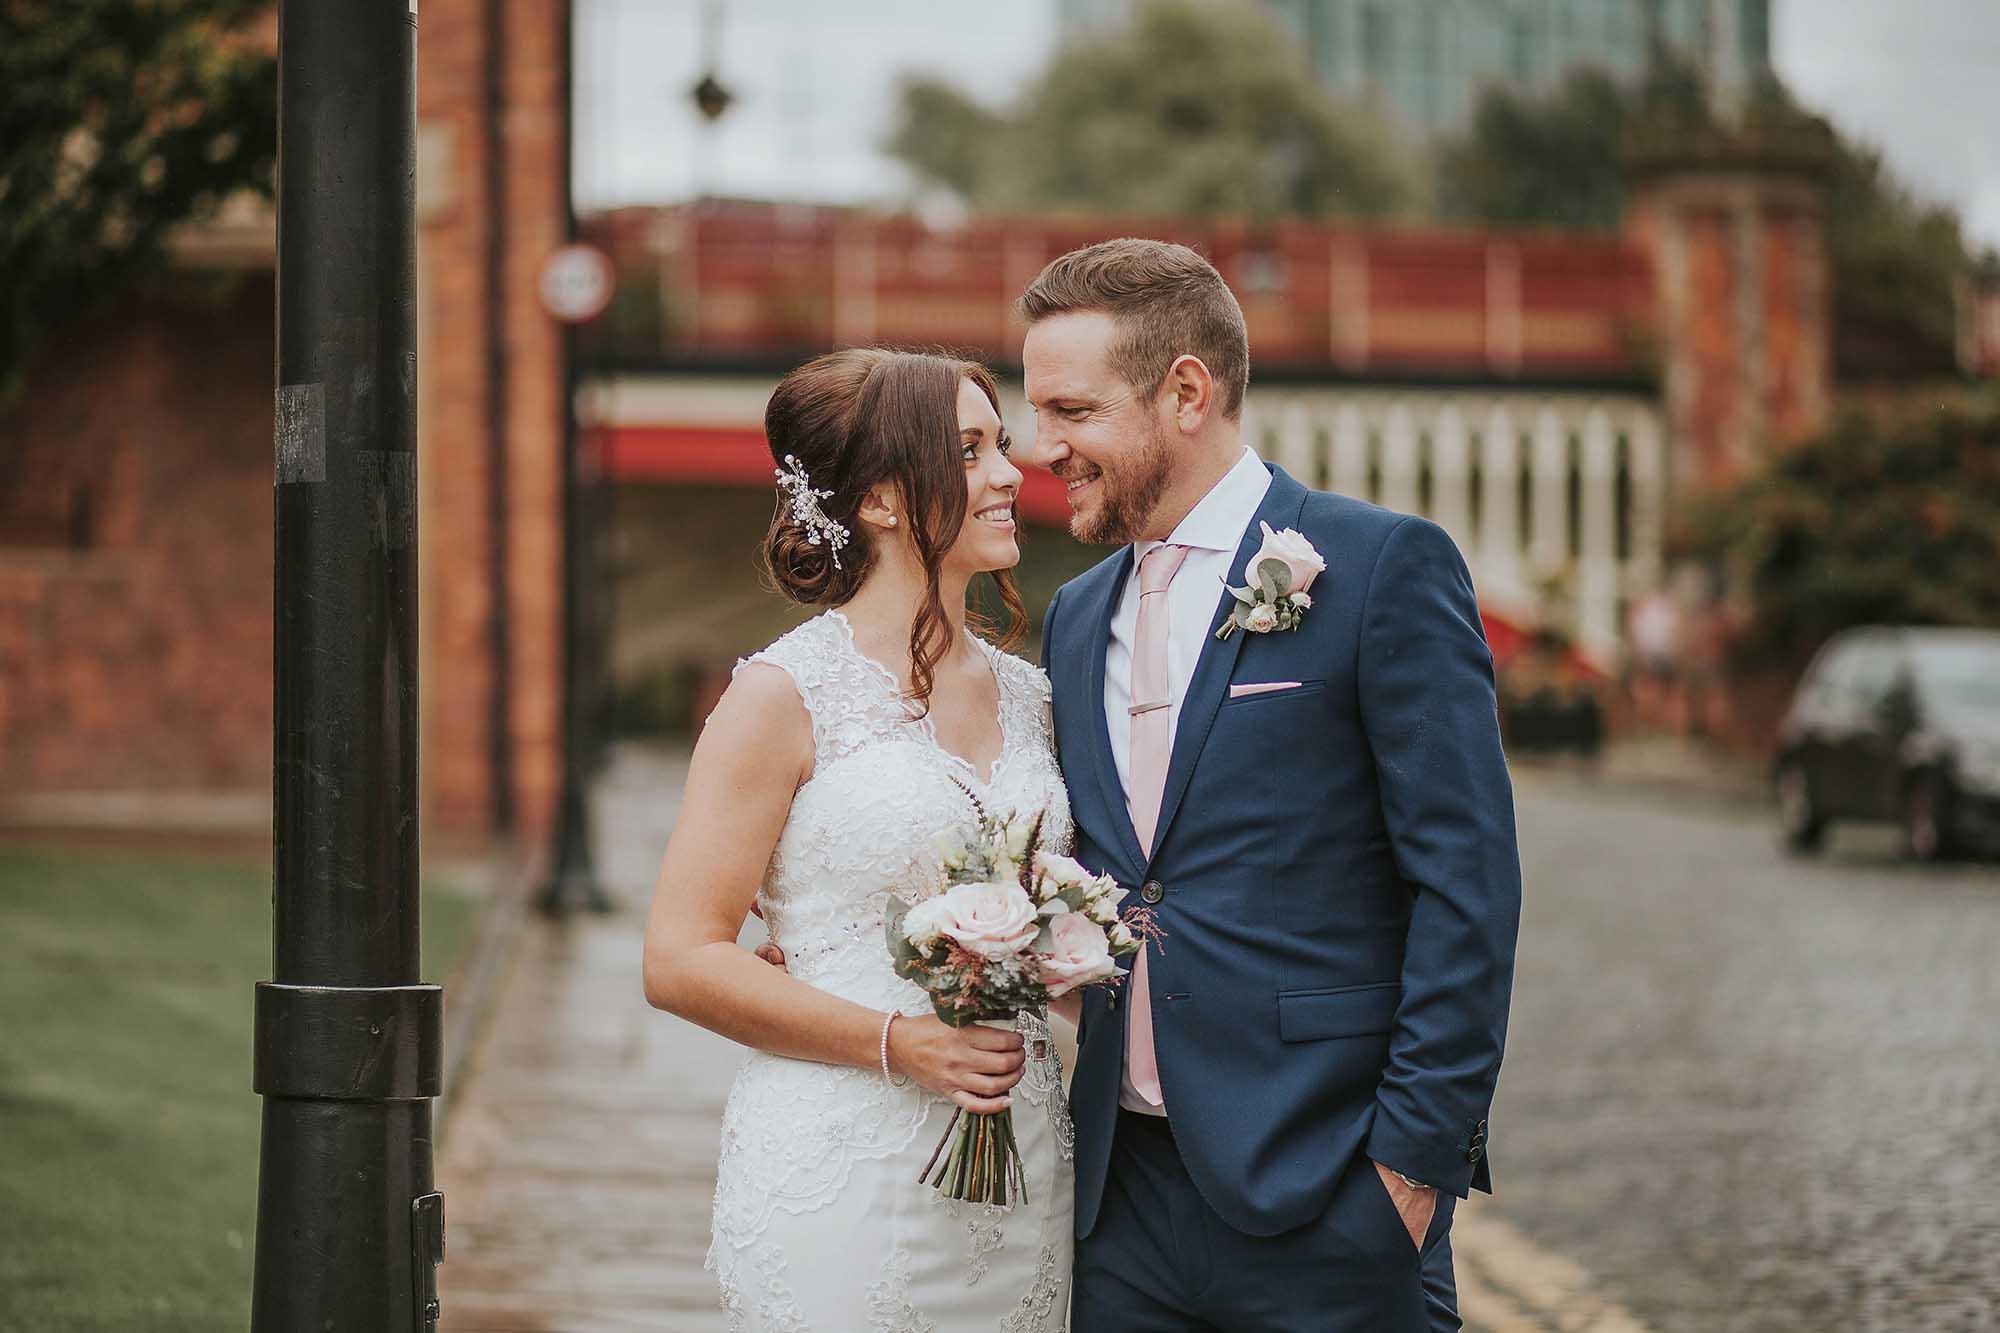 The Castlefield Rooms wedding photographer